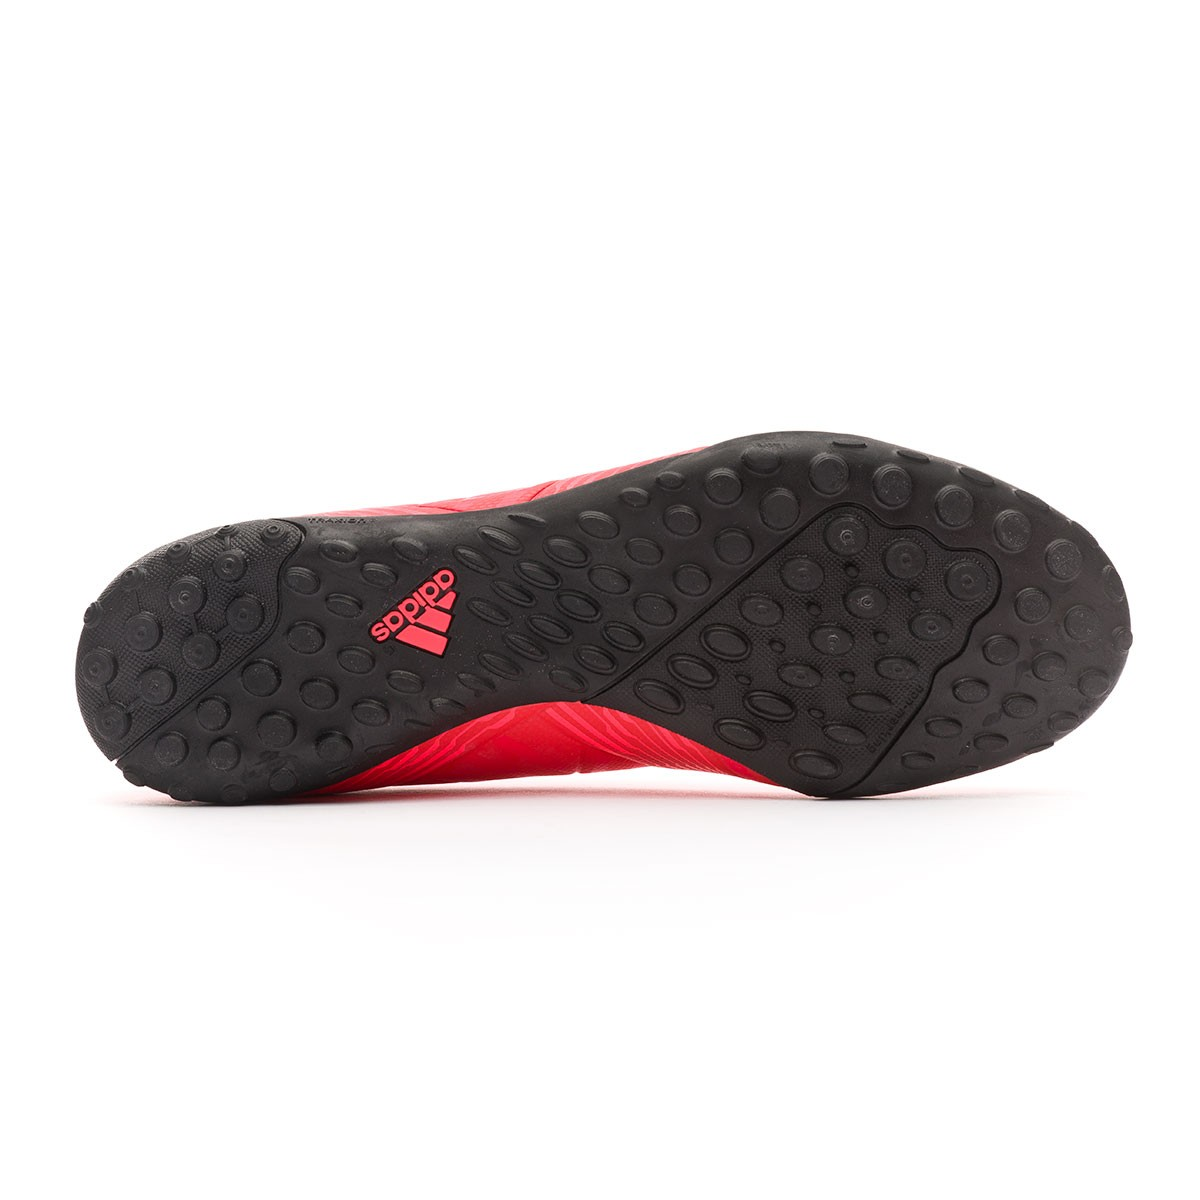 01efec2b3 Football Boot adidas Nemeziz Tango 17.4 Turf Real coral-Red zest-Core black  - Football store Fútbol Emotion